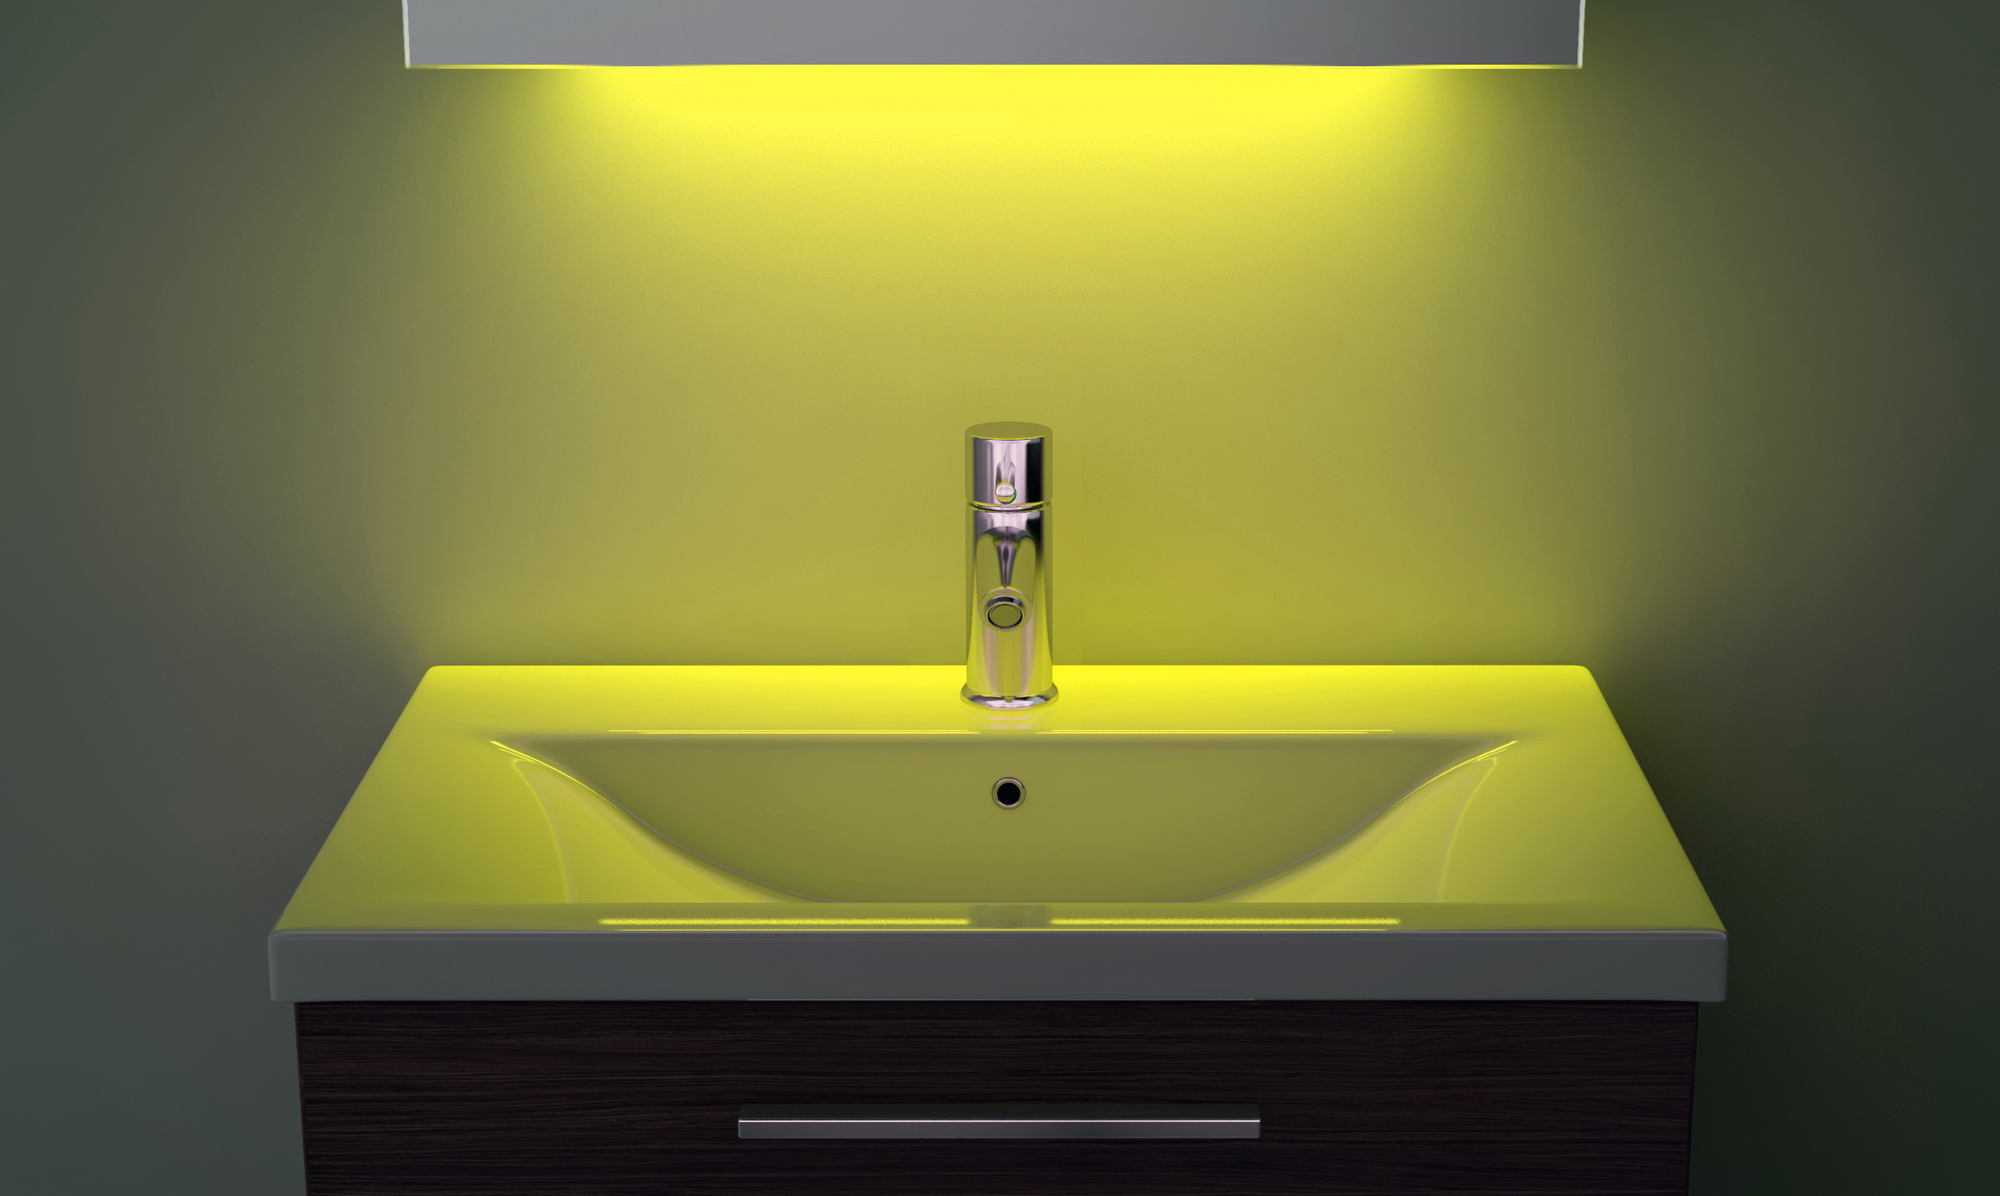 Digital Clock Shaver Bathroom Mirror With Under Lighting Demist Sensor K191y Ebay